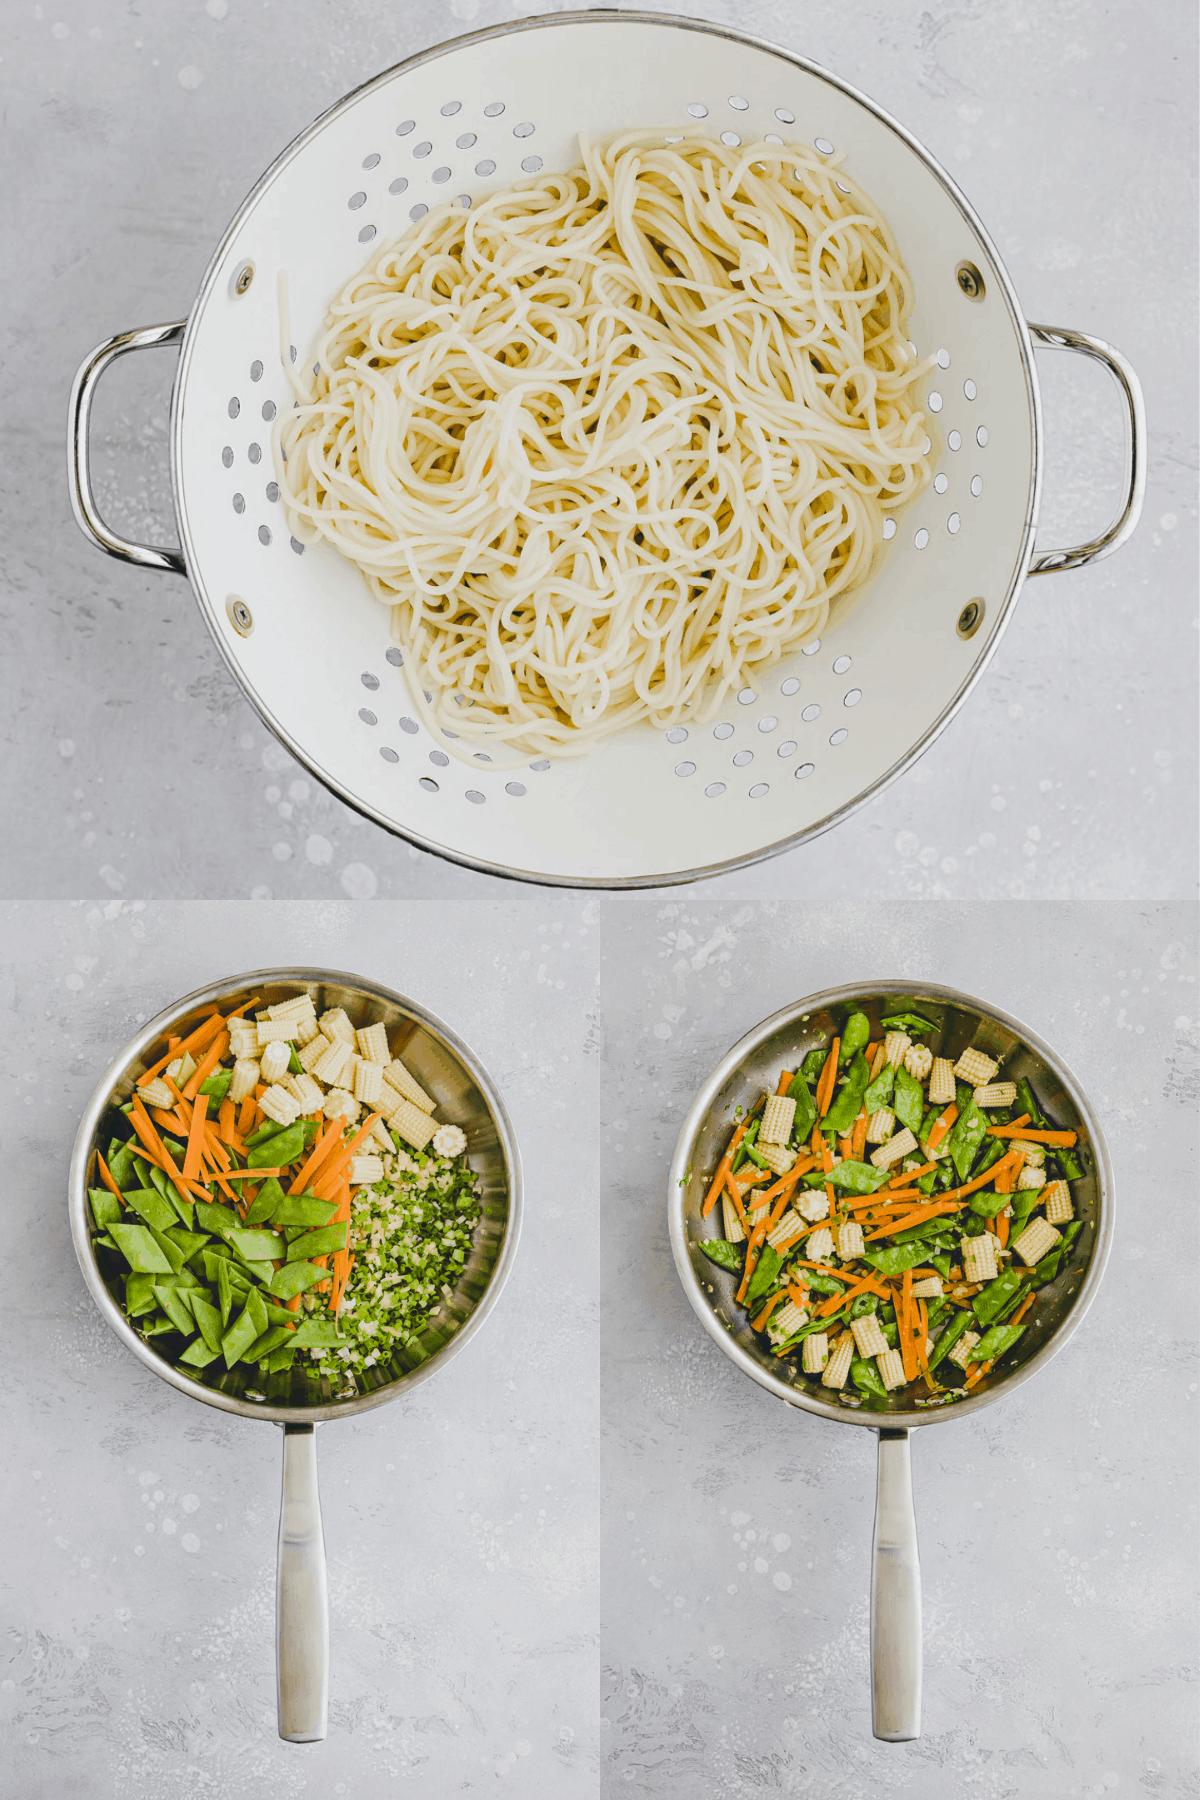 Lo Mein Noodles Recipe Step 1-3